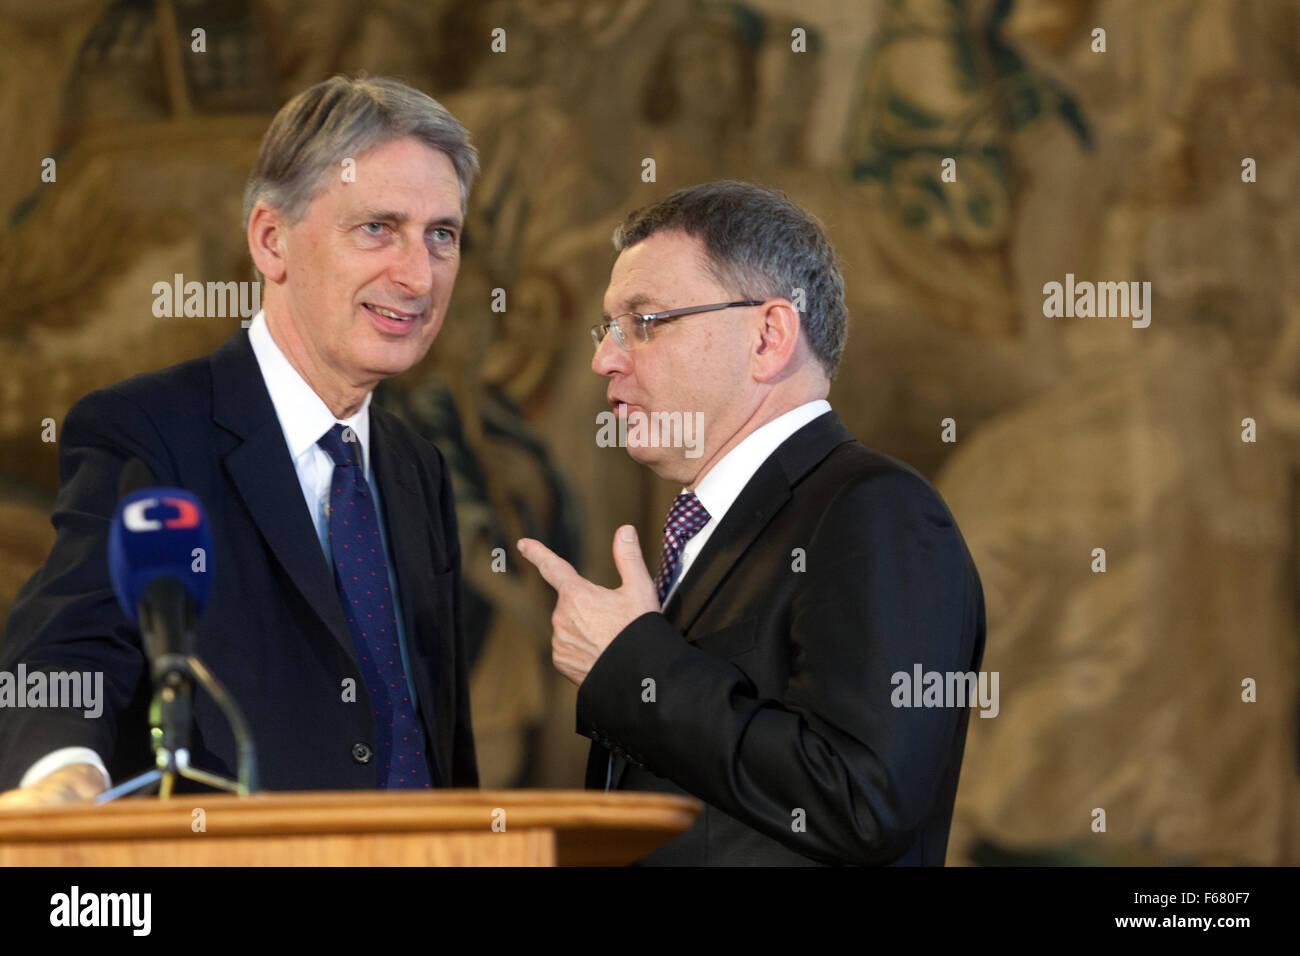 Prague, Czech Republic. 13th November, 2015. British Foreign Secretary Philip Hammond (L) and Czech Foreign Minister - Stock Image